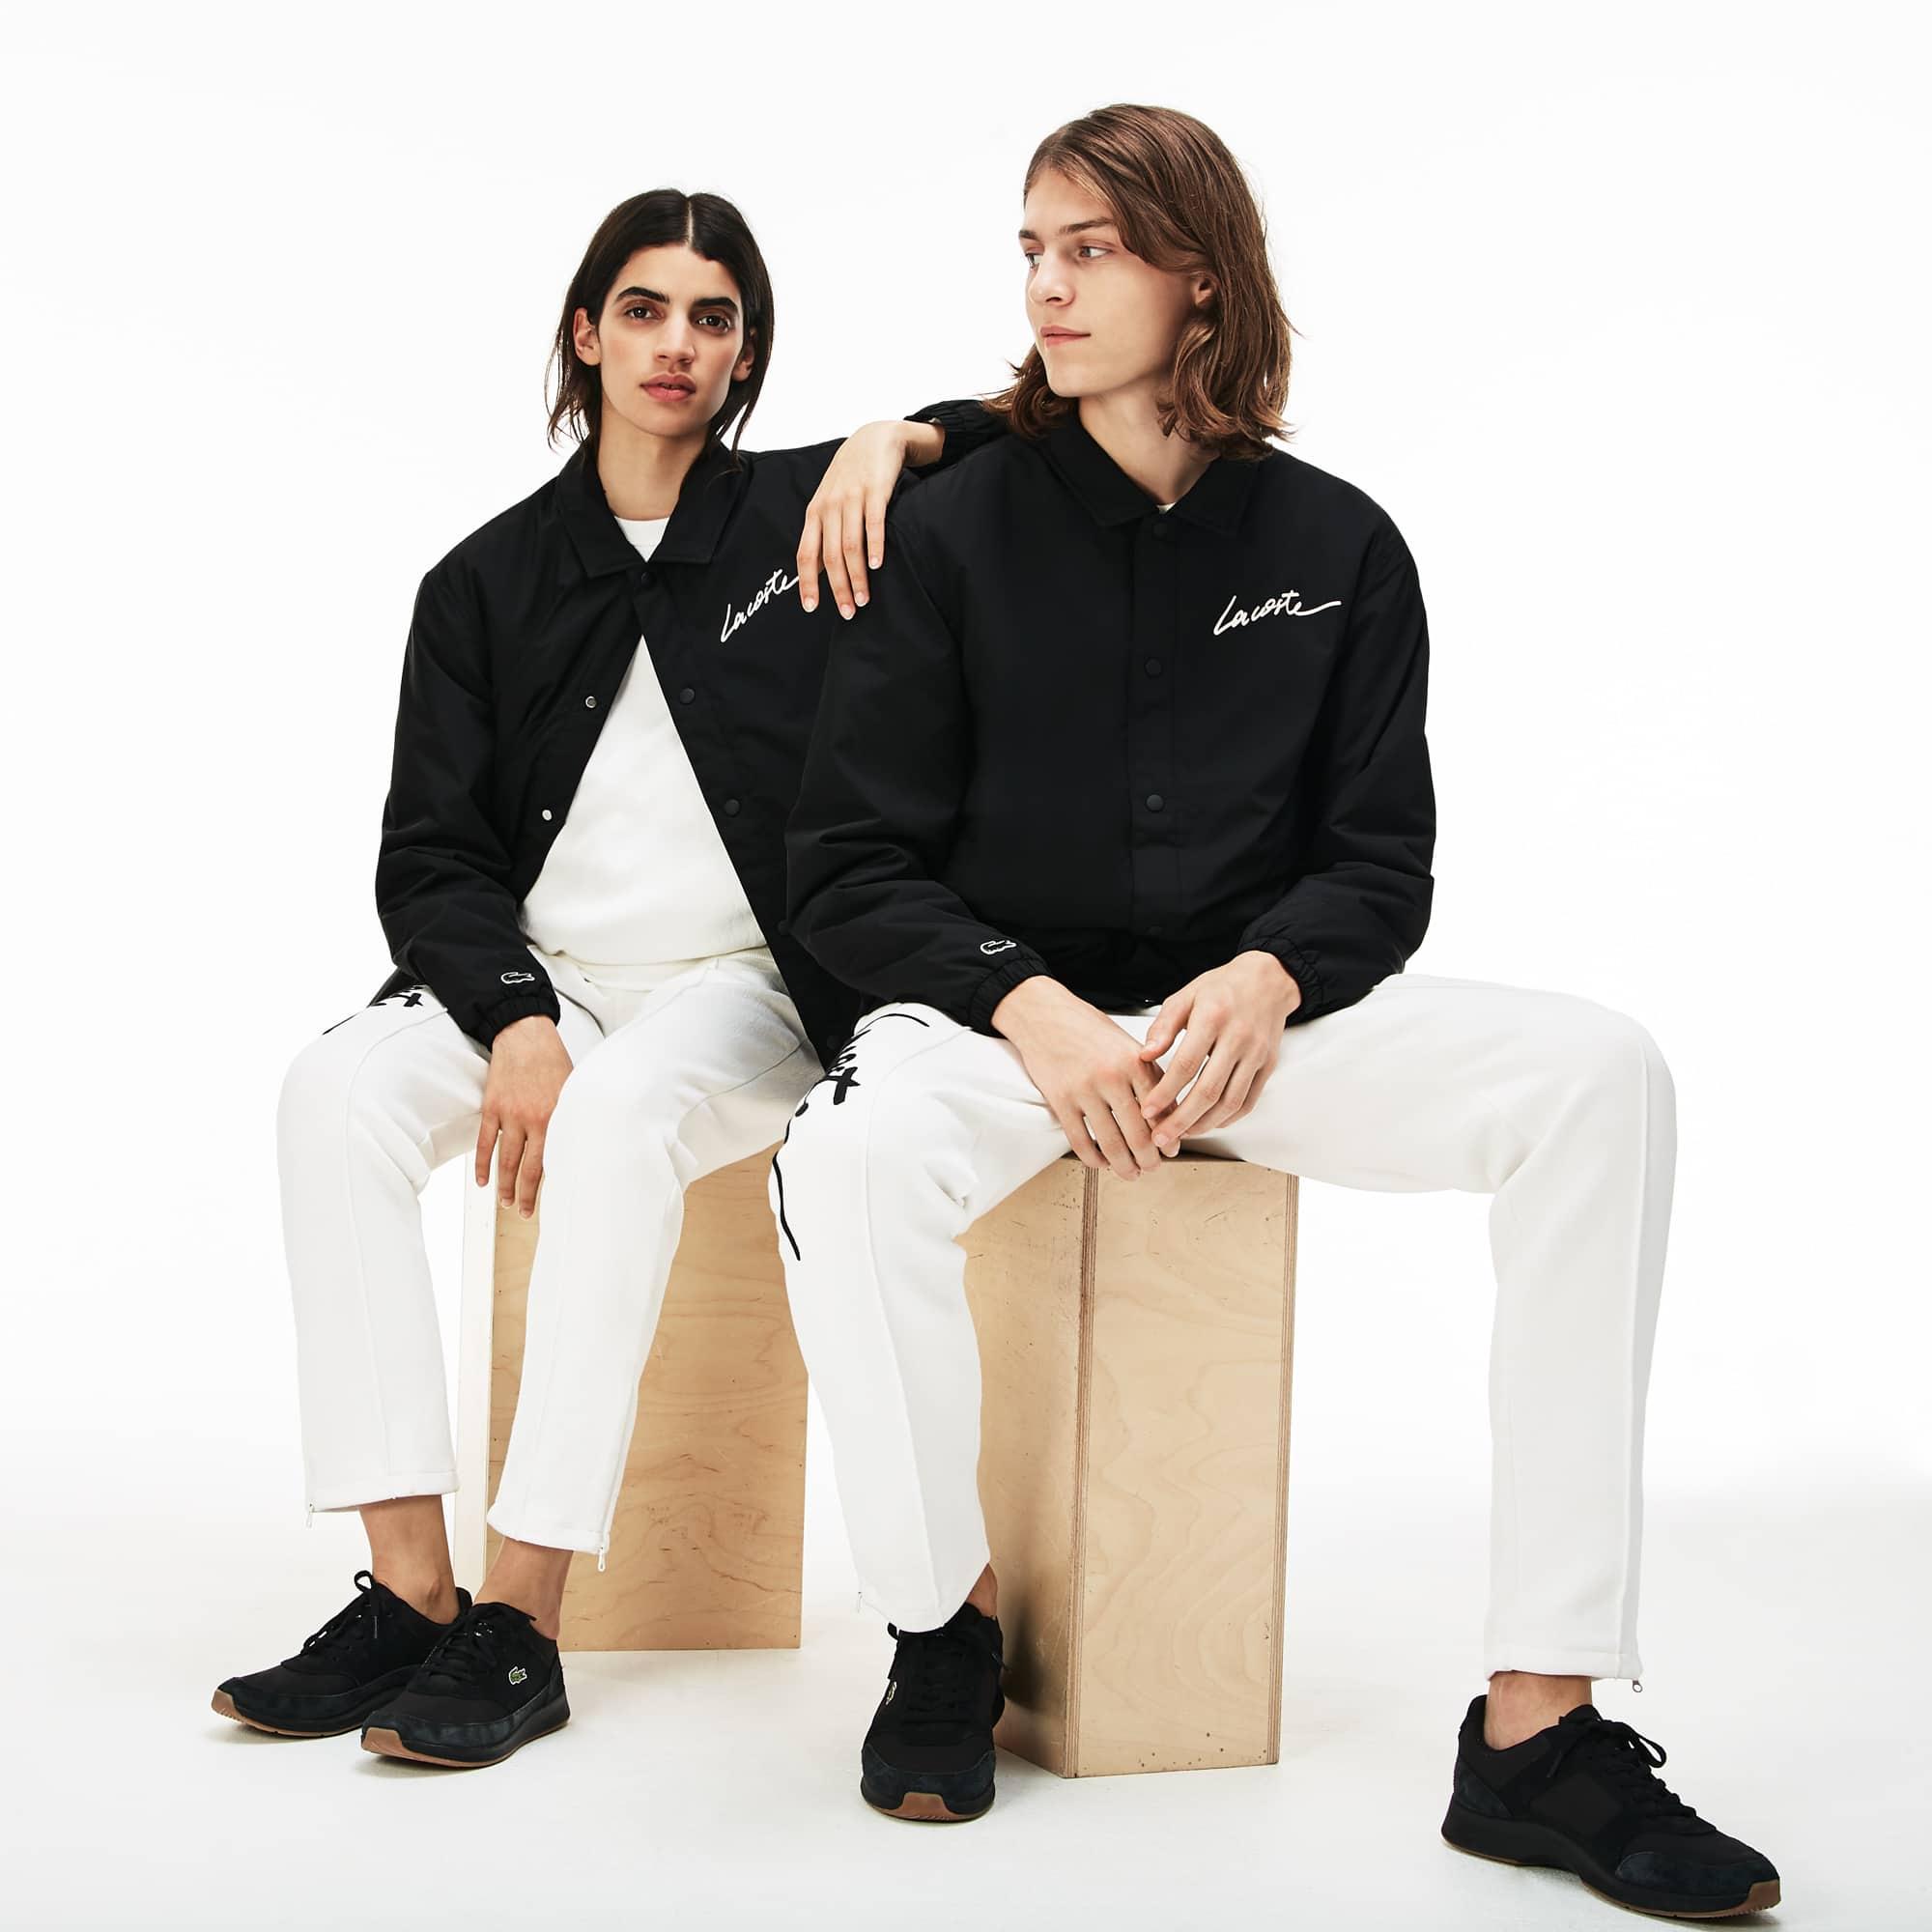 Men's Lacoste LIVE Lacoste Signature Taffeta Jacket